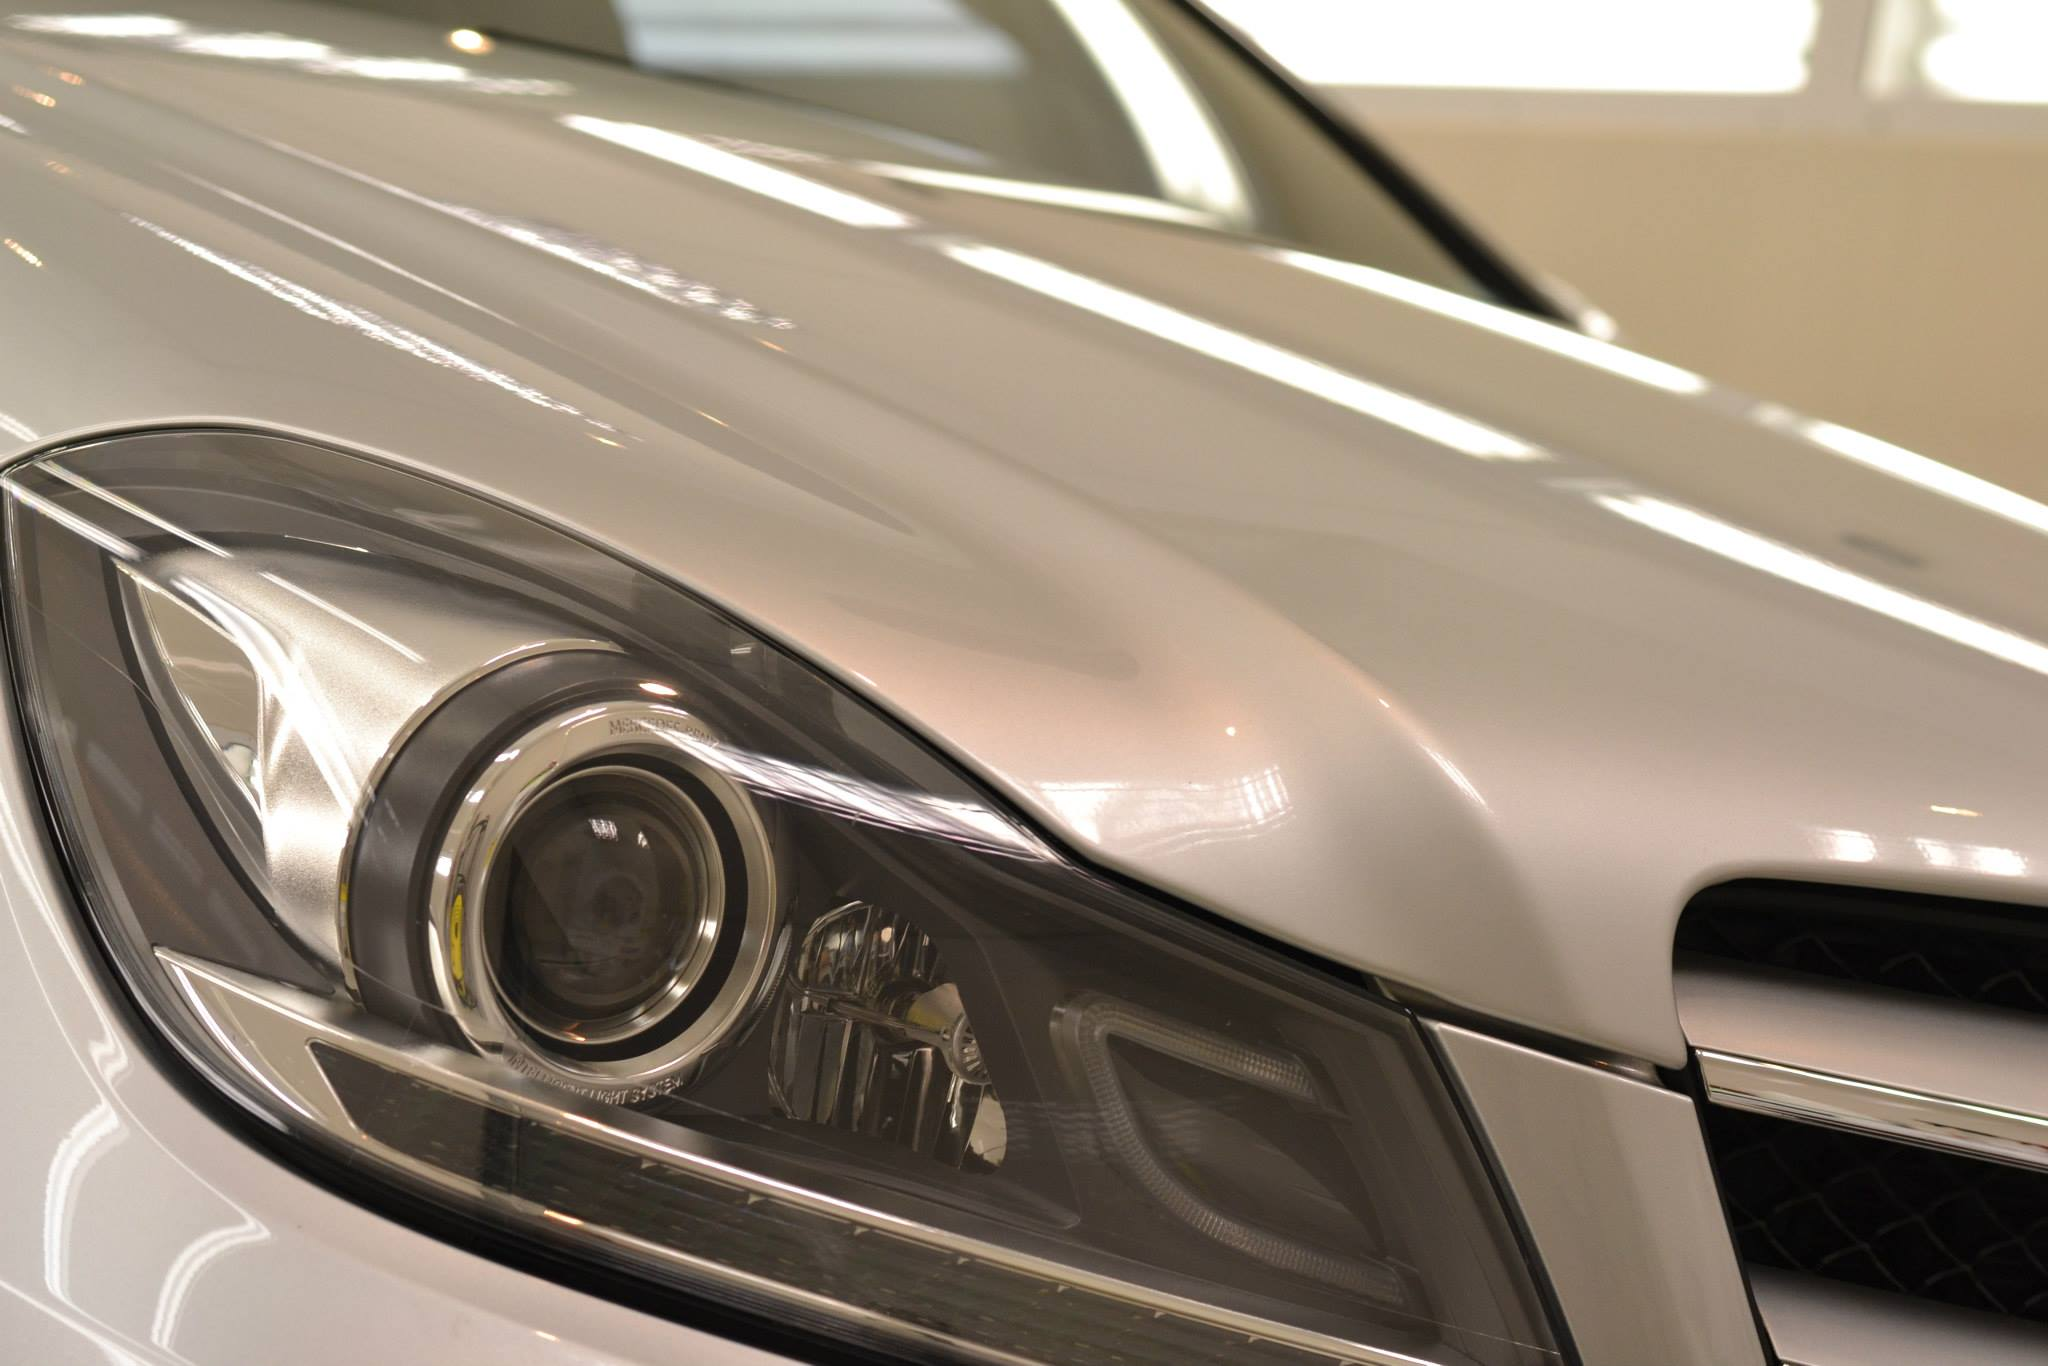 Mercedes benz c250 shiny cars argentina for Mercedes benz fayetteville ar